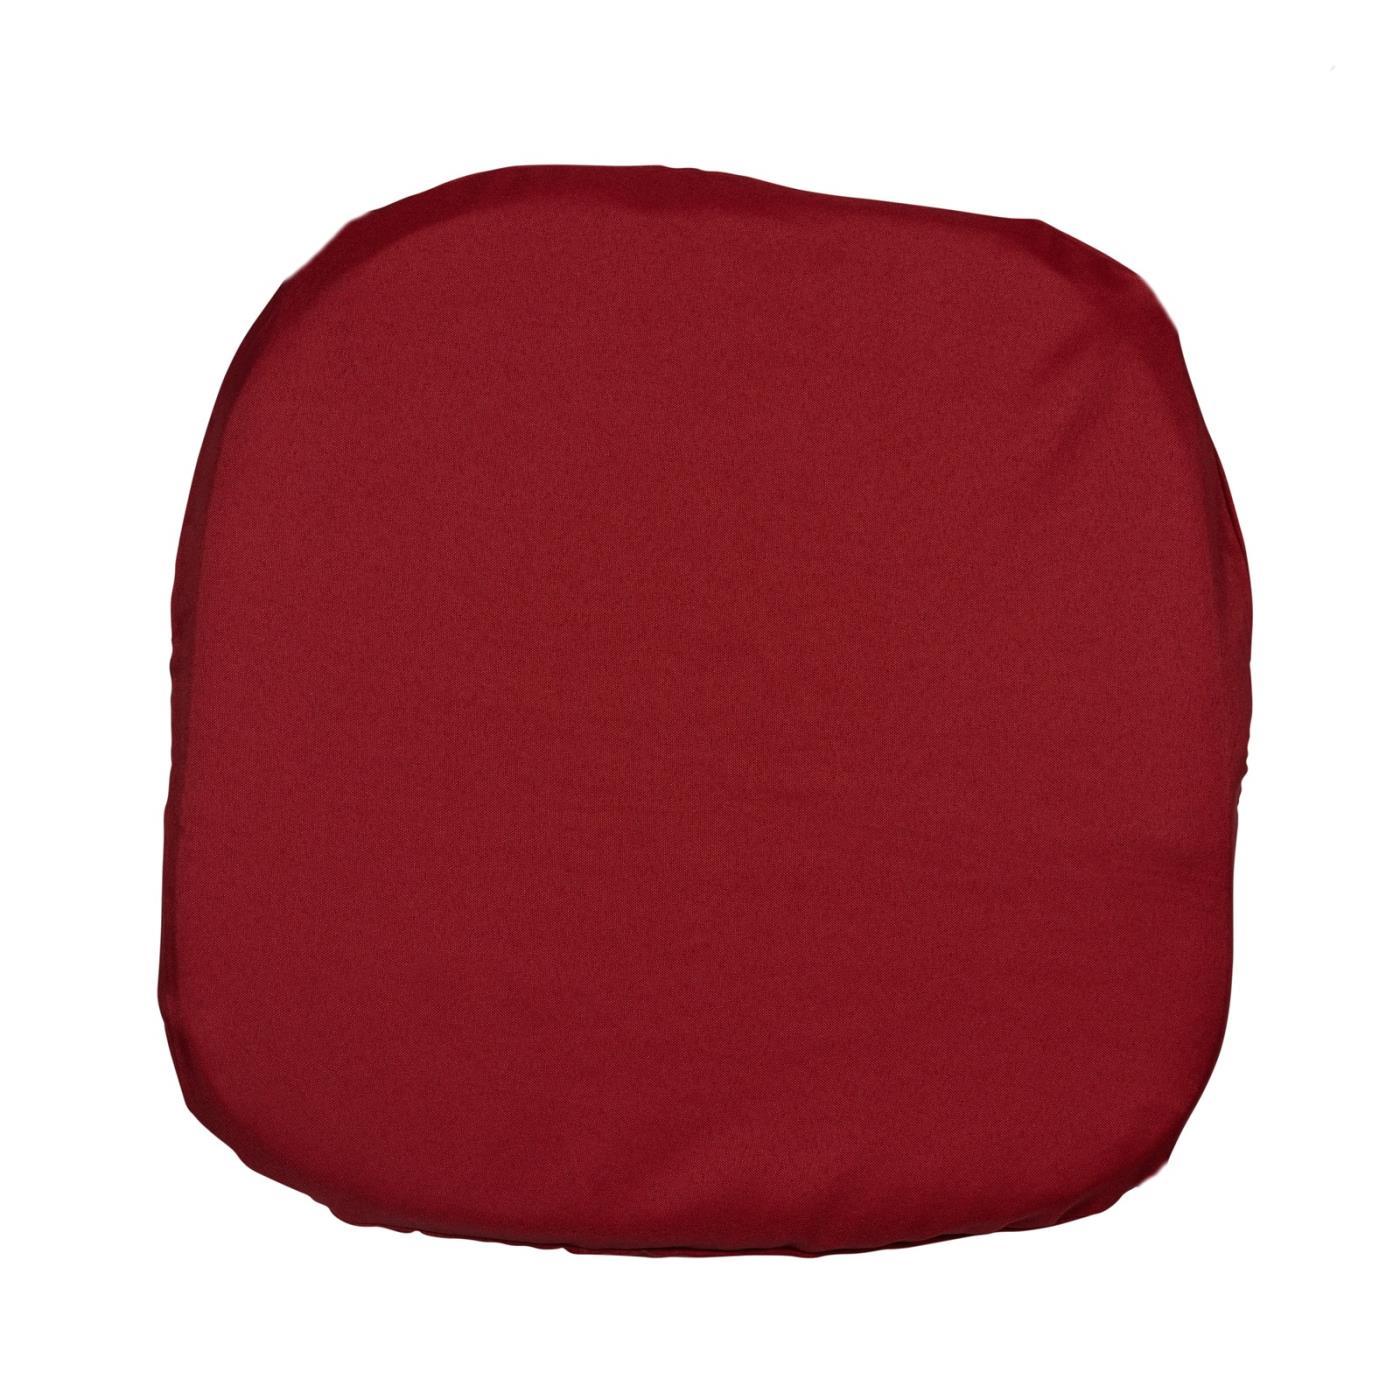 Poly Seat Cushion - Brick